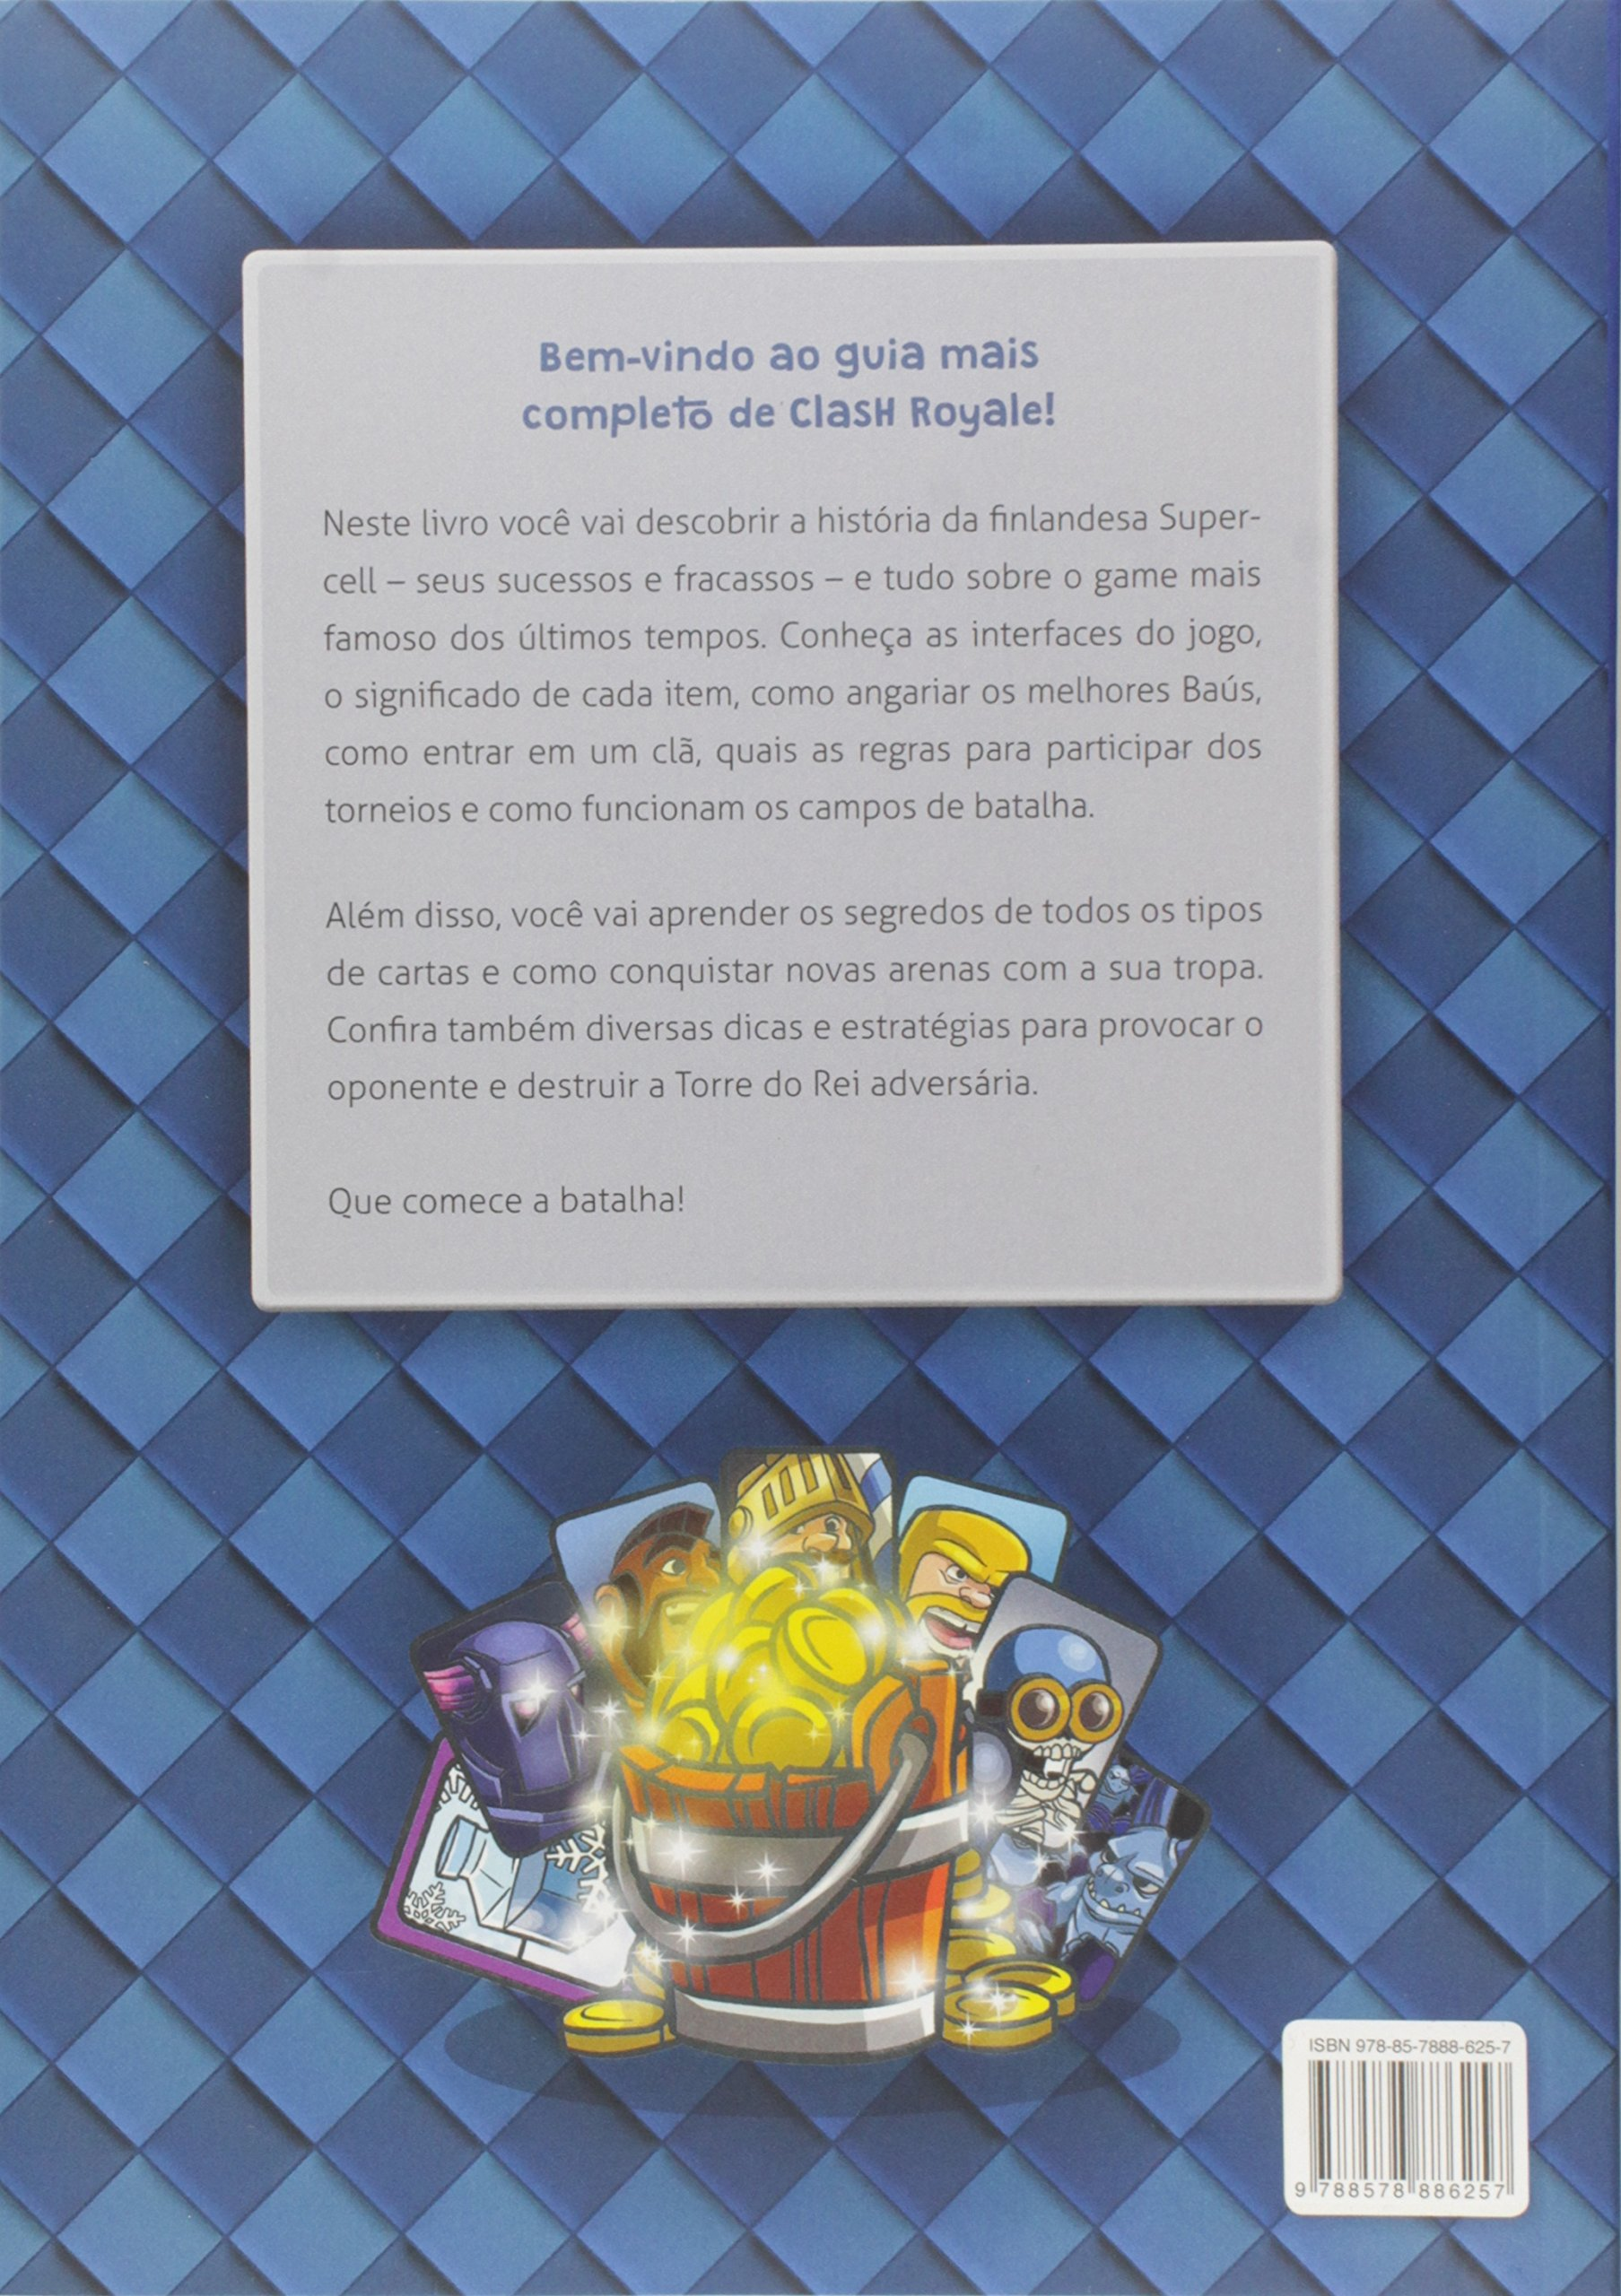 Clash Royale (Em Portuguese do Brasil): Amazon.es: Libros